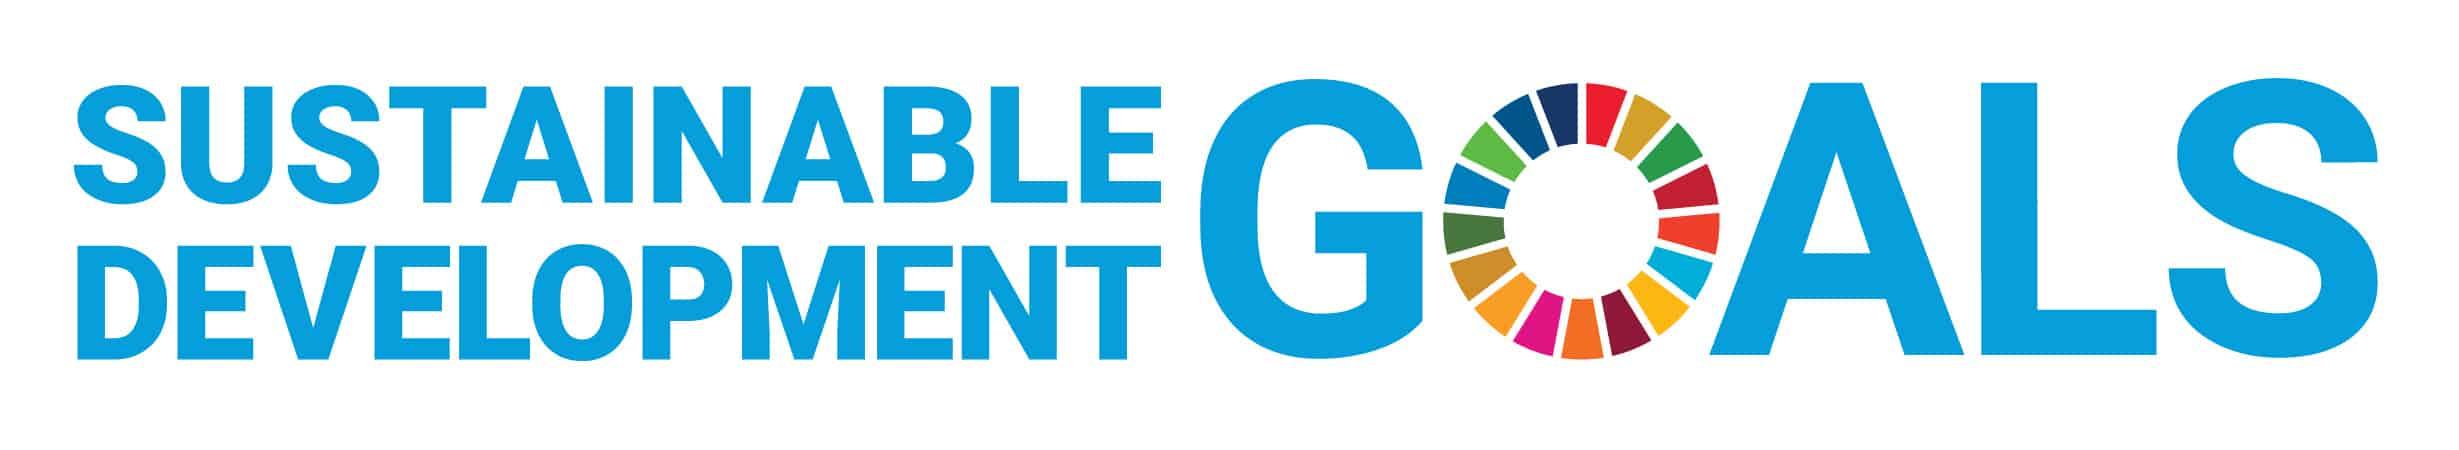 Go Goals! SDG board game